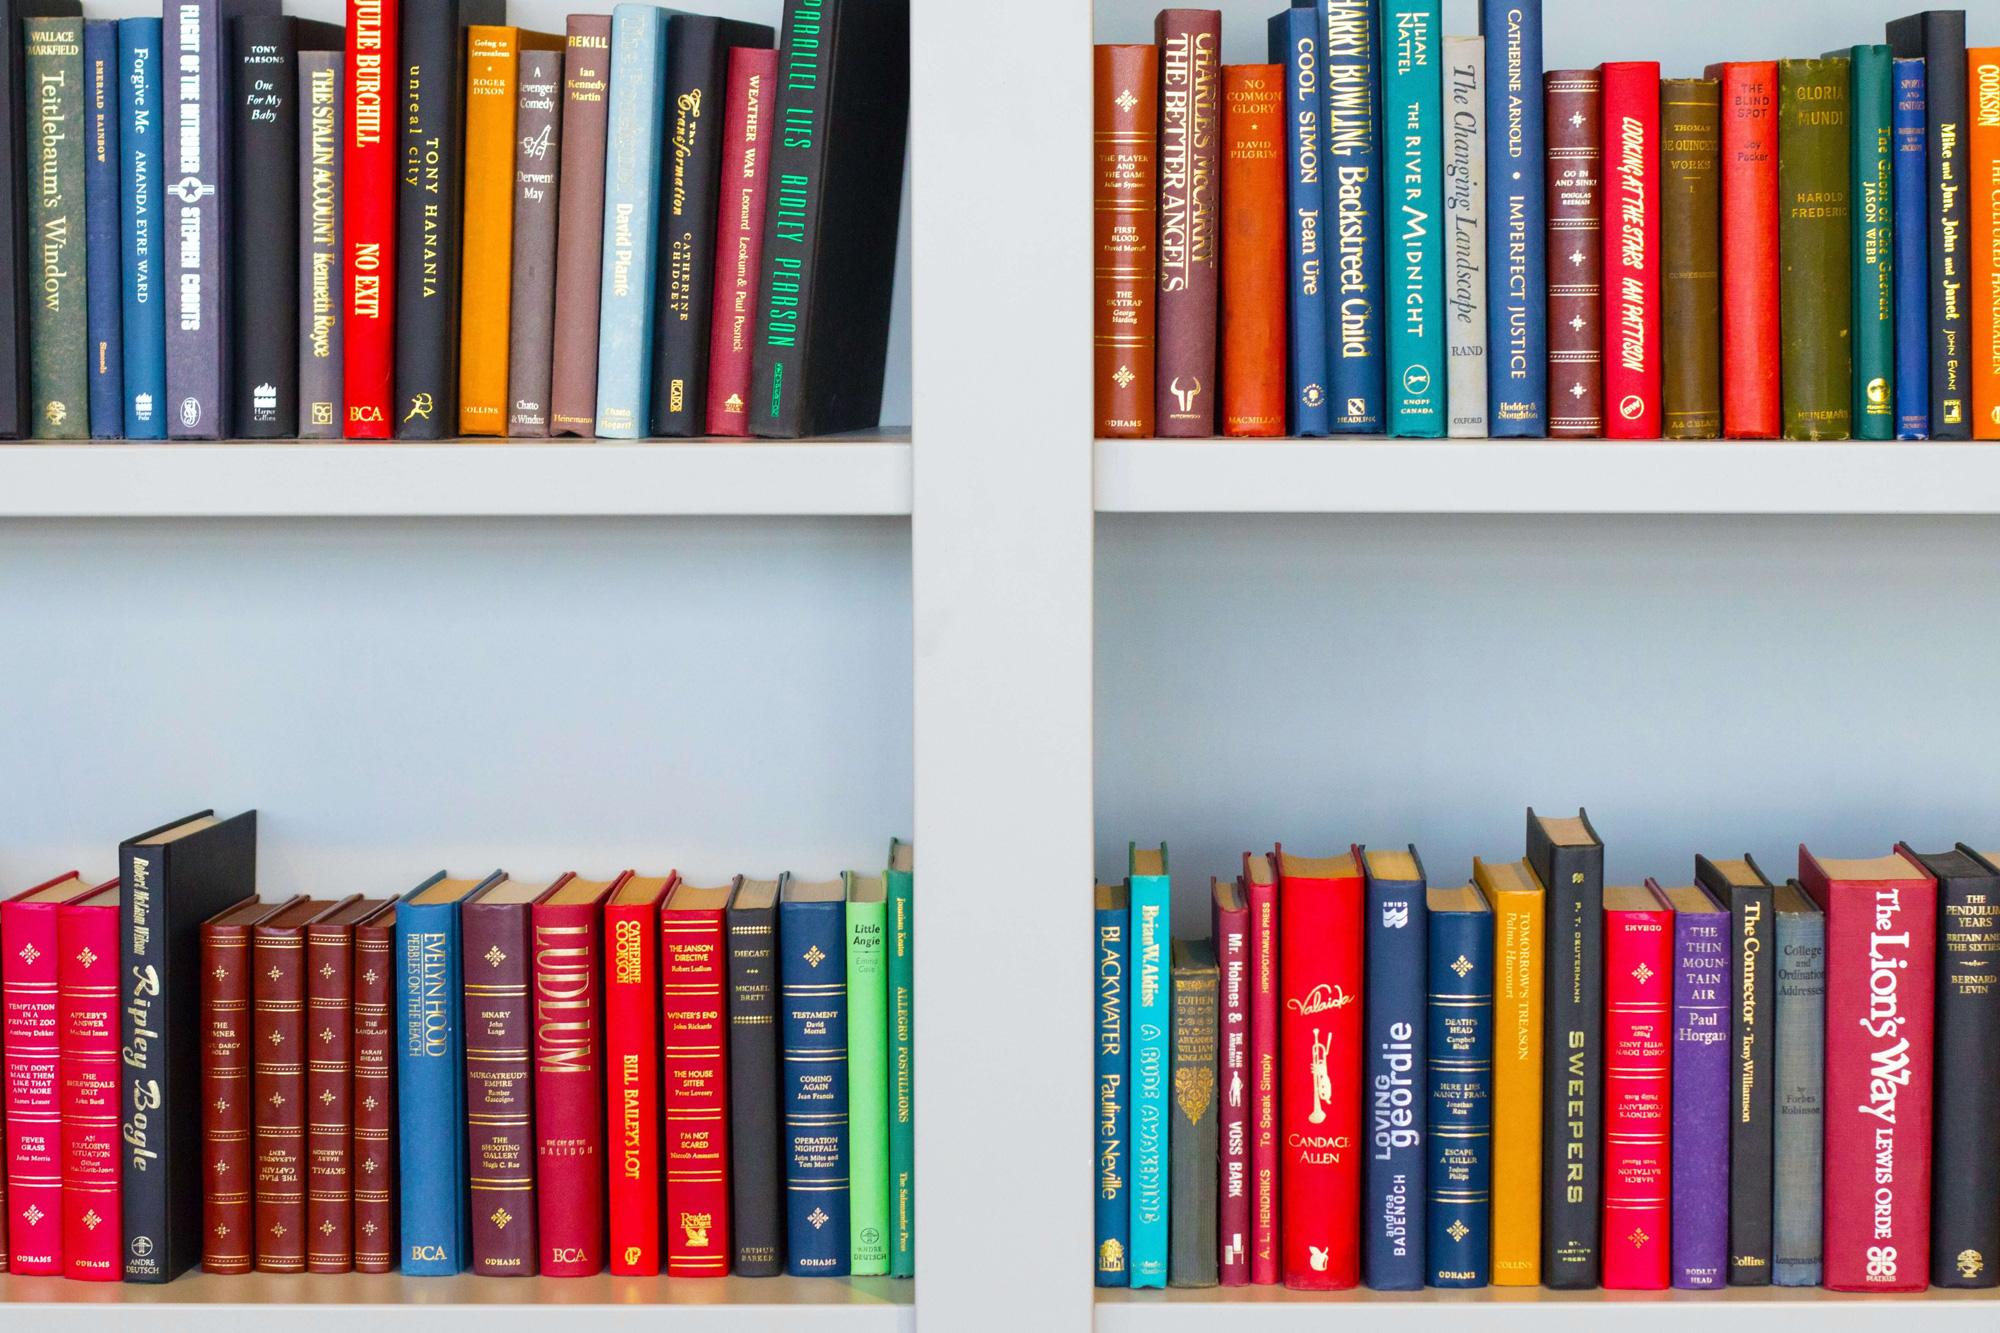 Best Web Design Books